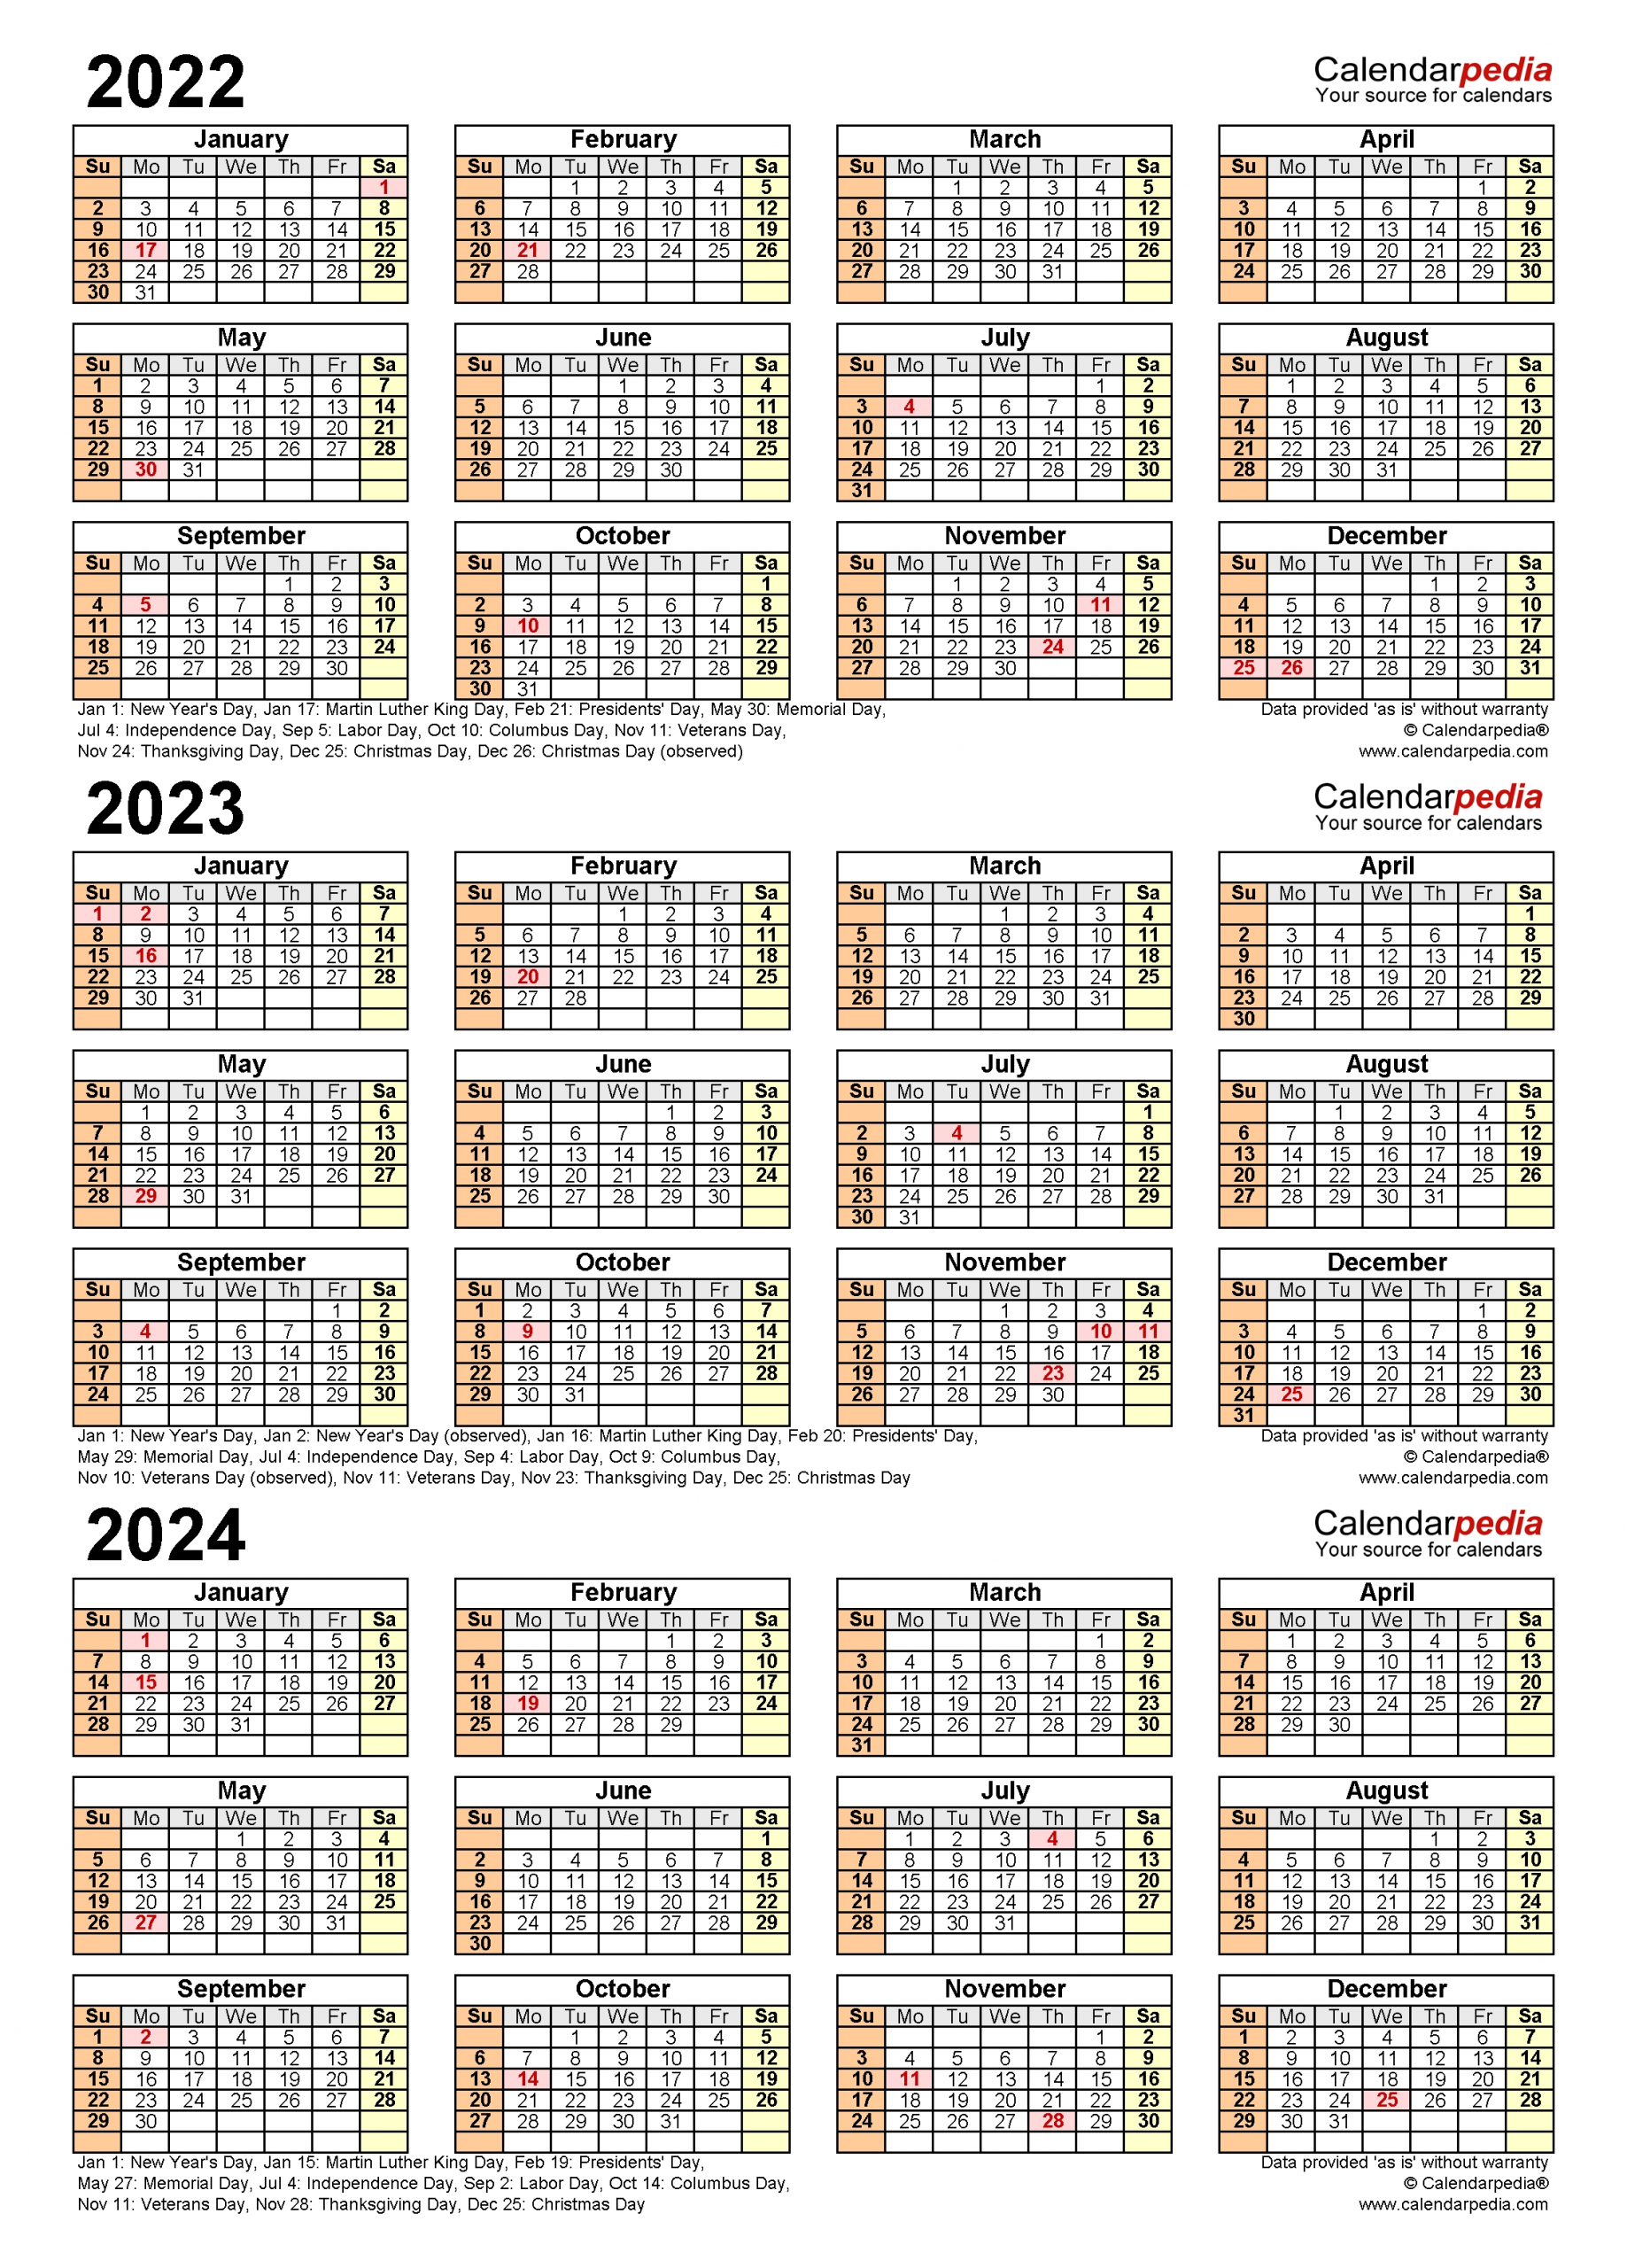 2022-2024 Three Year Calendar - Free Printable Excel Templates